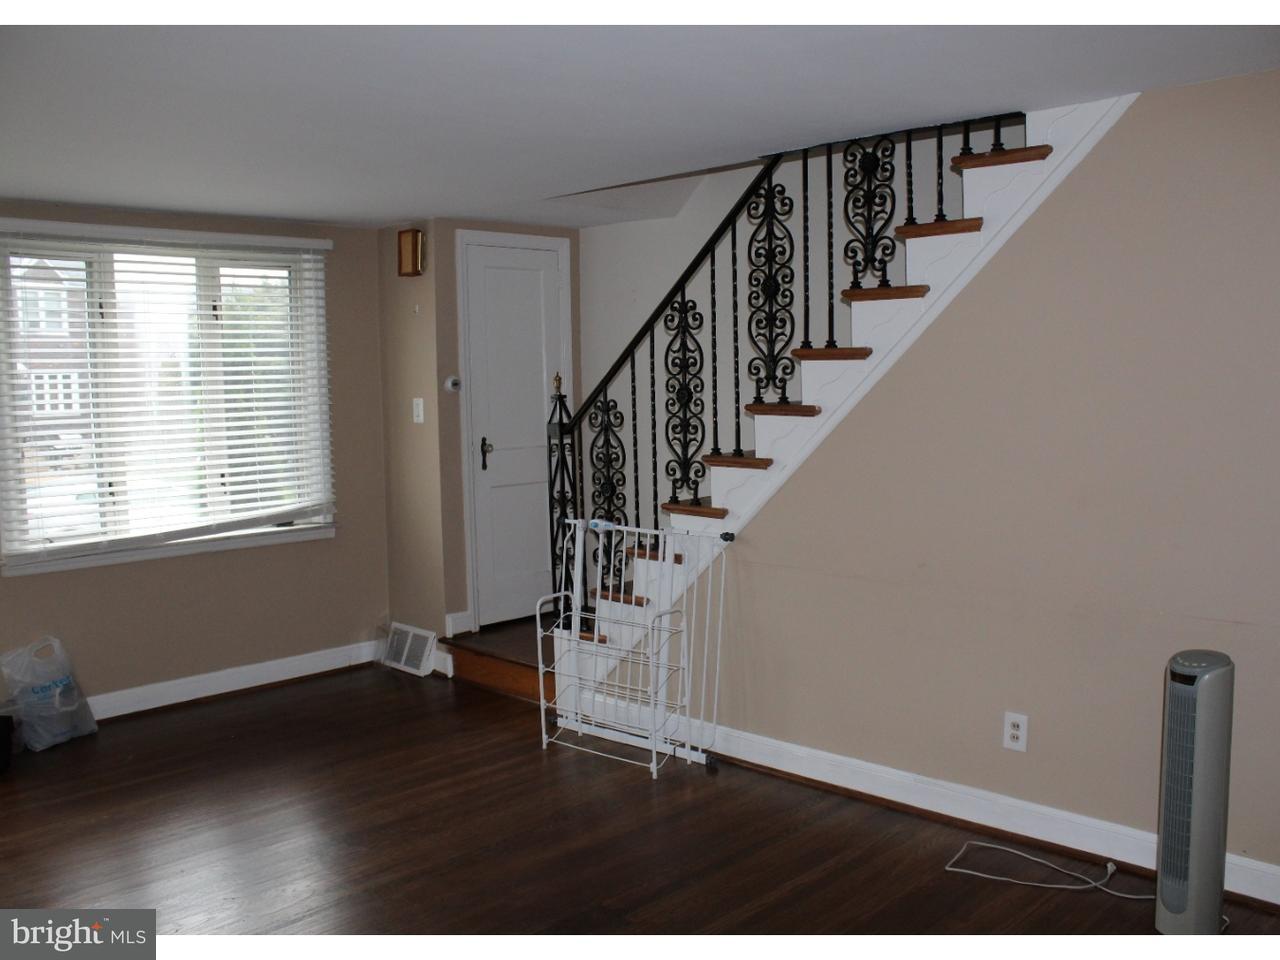 861  Fairfax Drexel Hill , PA 19026